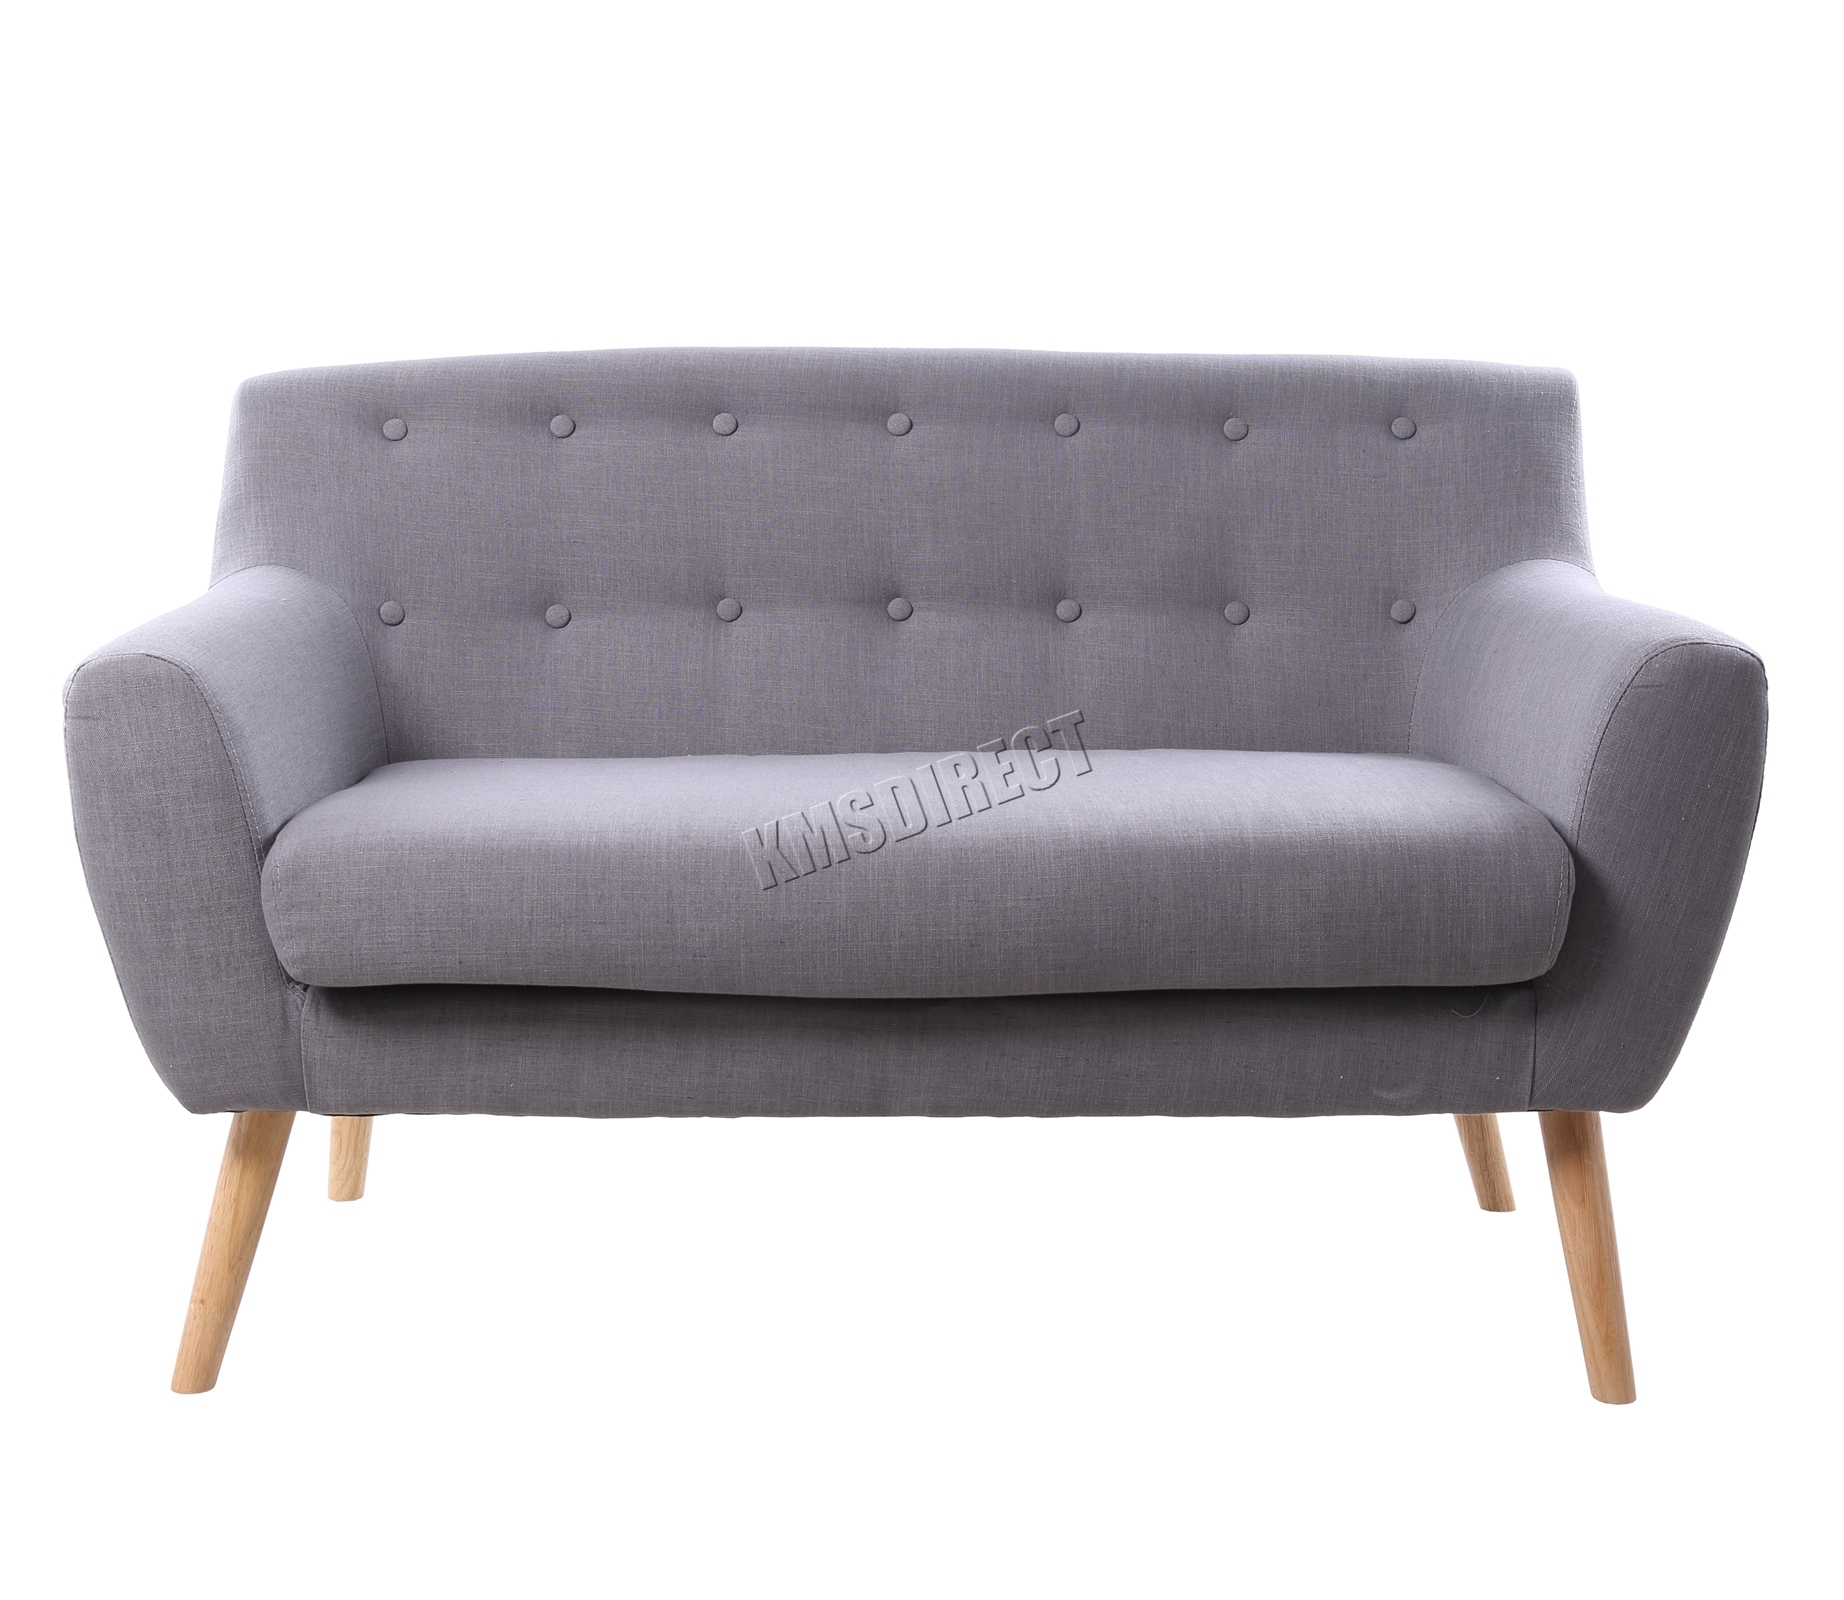 esszimmer sofabank inspiration f r die gestaltung der besten r ume. Black Bedroom Furniture Sets. Home Design Ideas